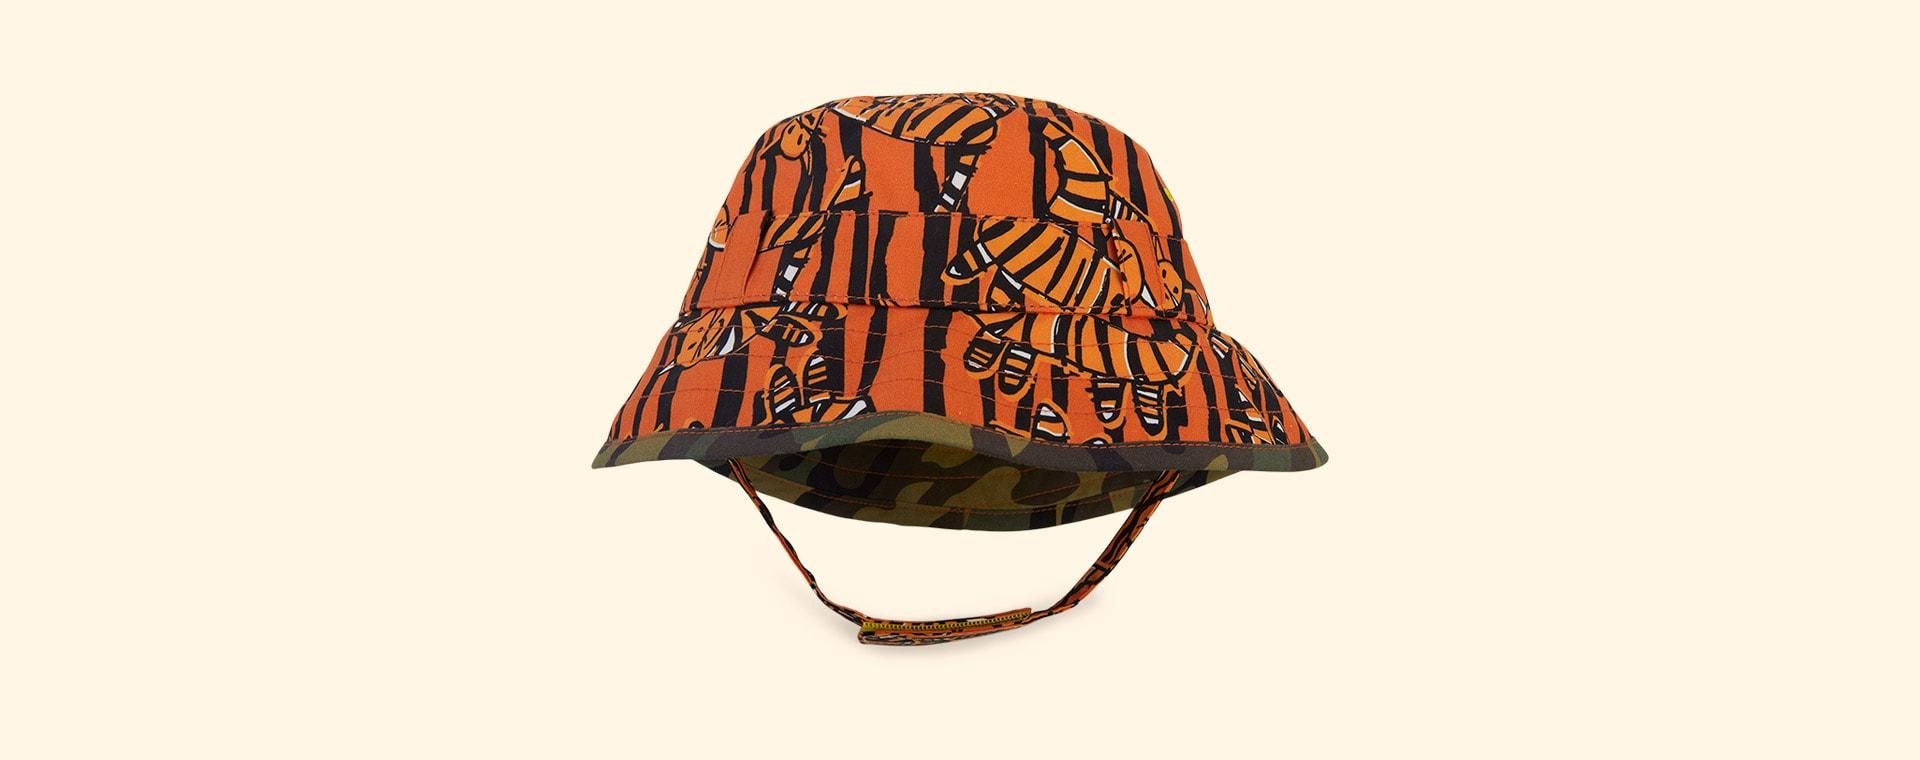 Tiger King Little Hotdog Watson The Adventurer Bucket Hat